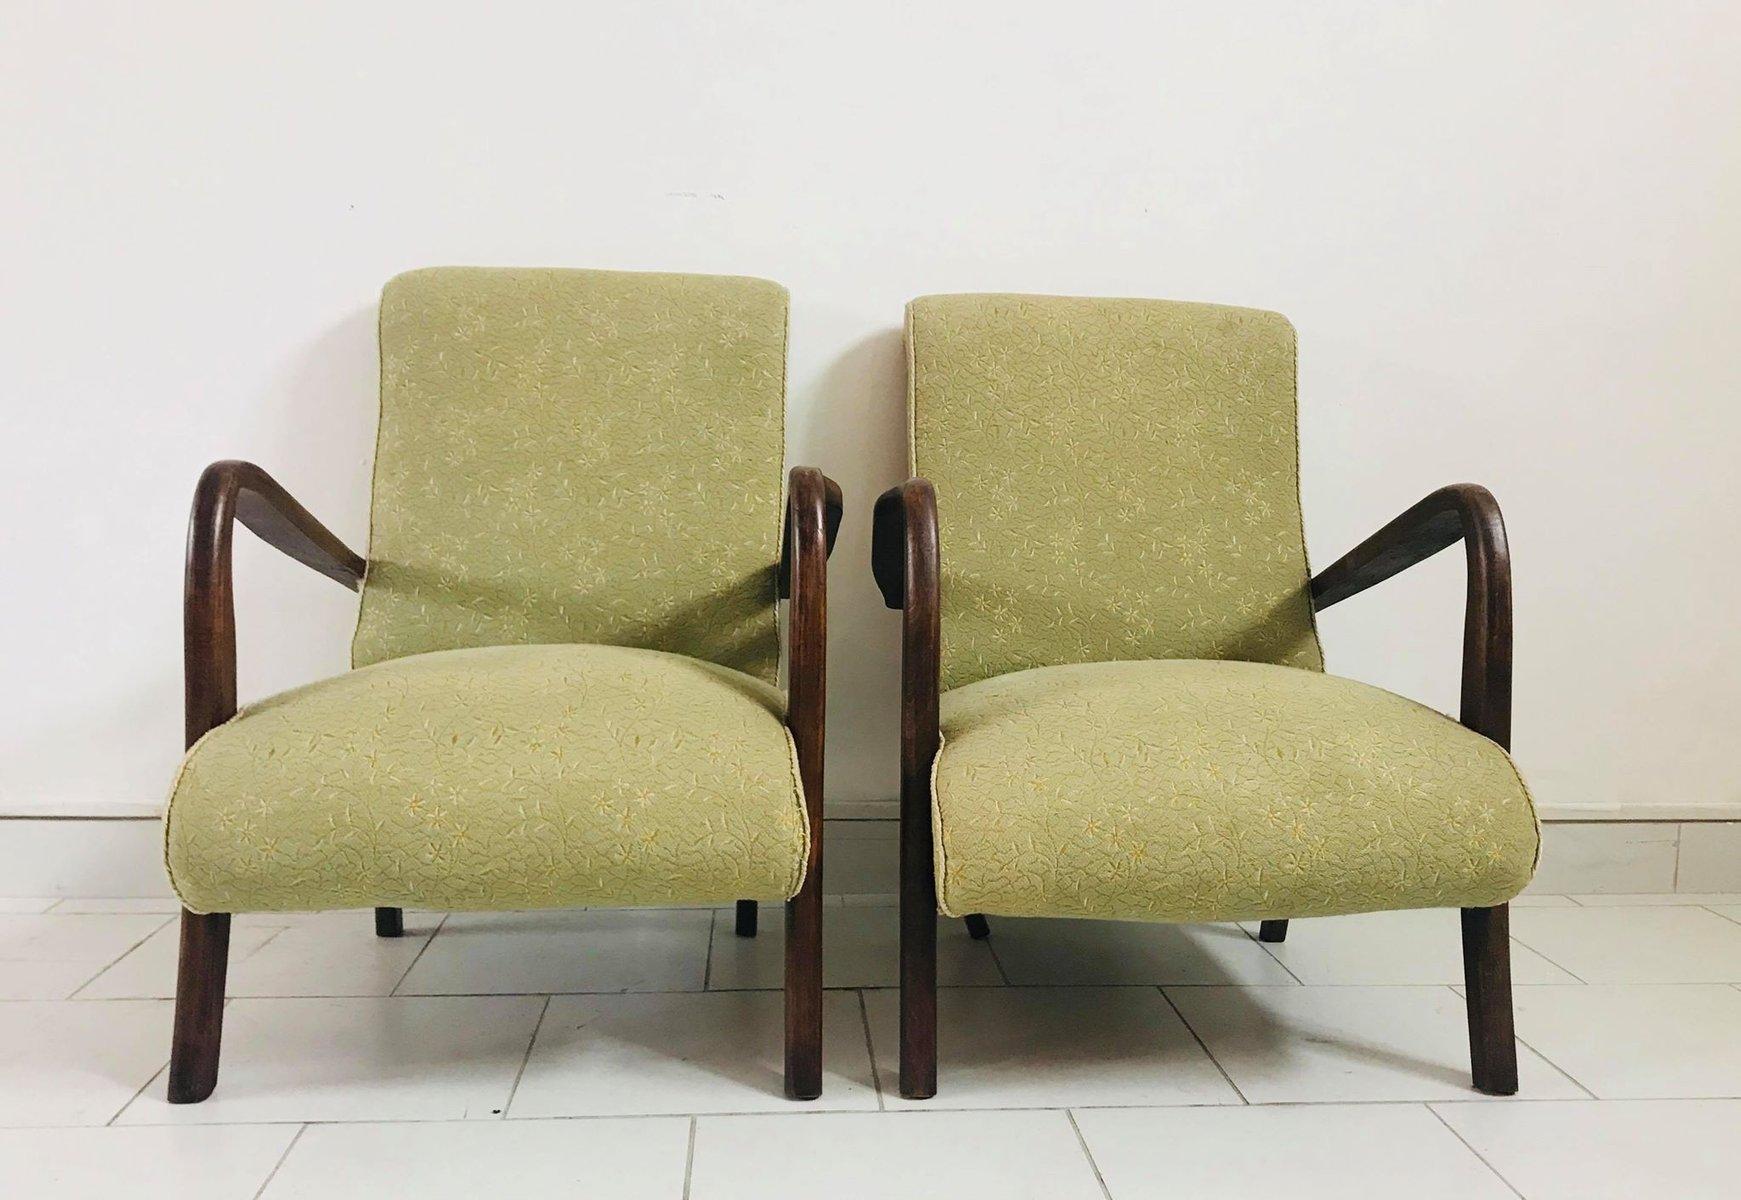 liberty sessel mit mahagoni gestell 1950er bei pamono kaufen. Black Bedroom Furniture Sets. Home Design Ideas